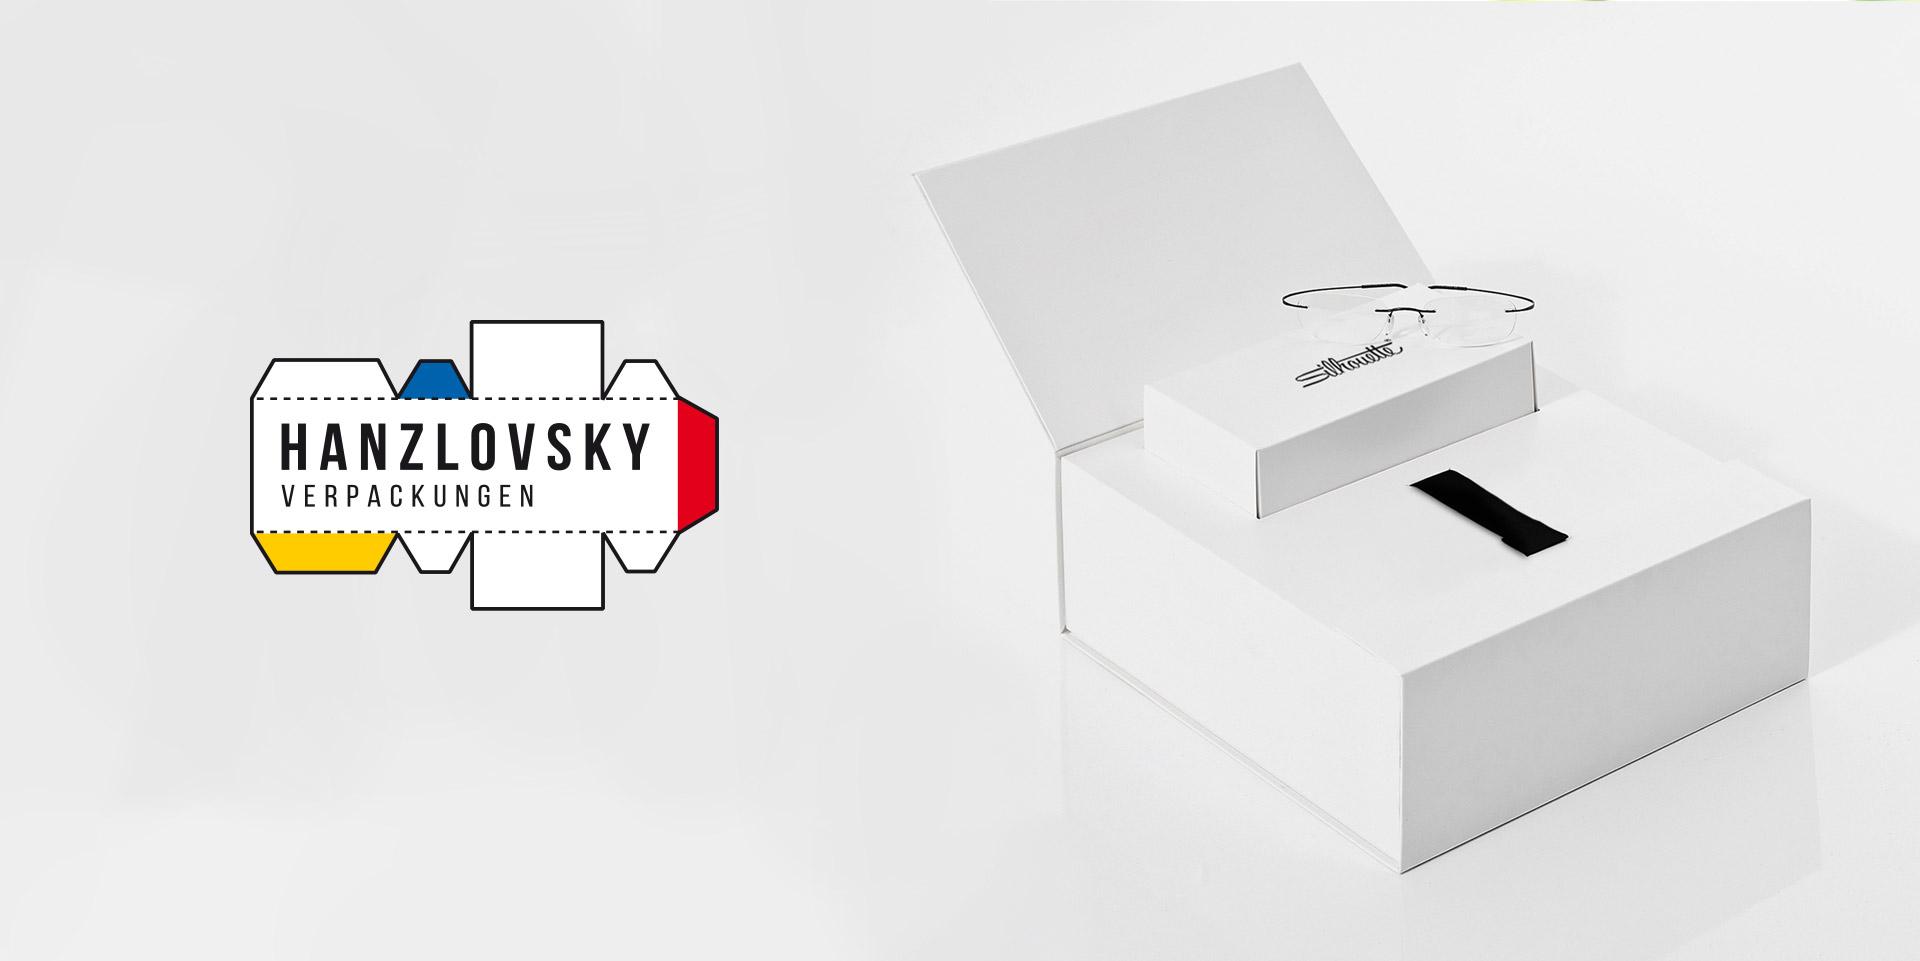 Hanzlovsky_quadratisch-1